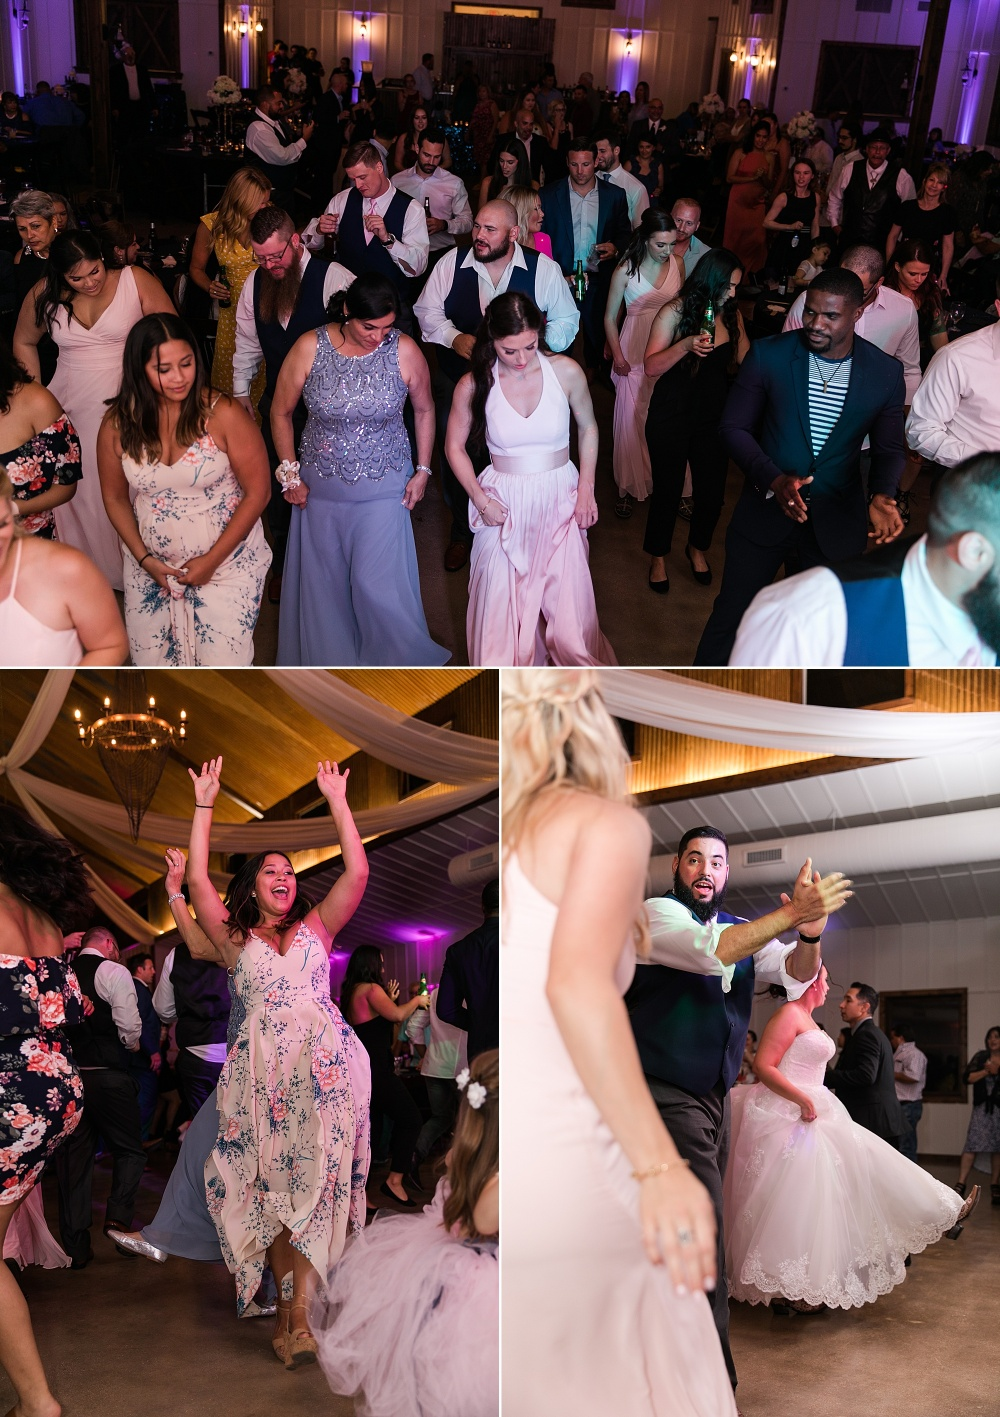 Wedding-Photographer-Bulverde-Texas-Western-Sky-Event-Venue-Carly-Barton-Photography_0081.jpg